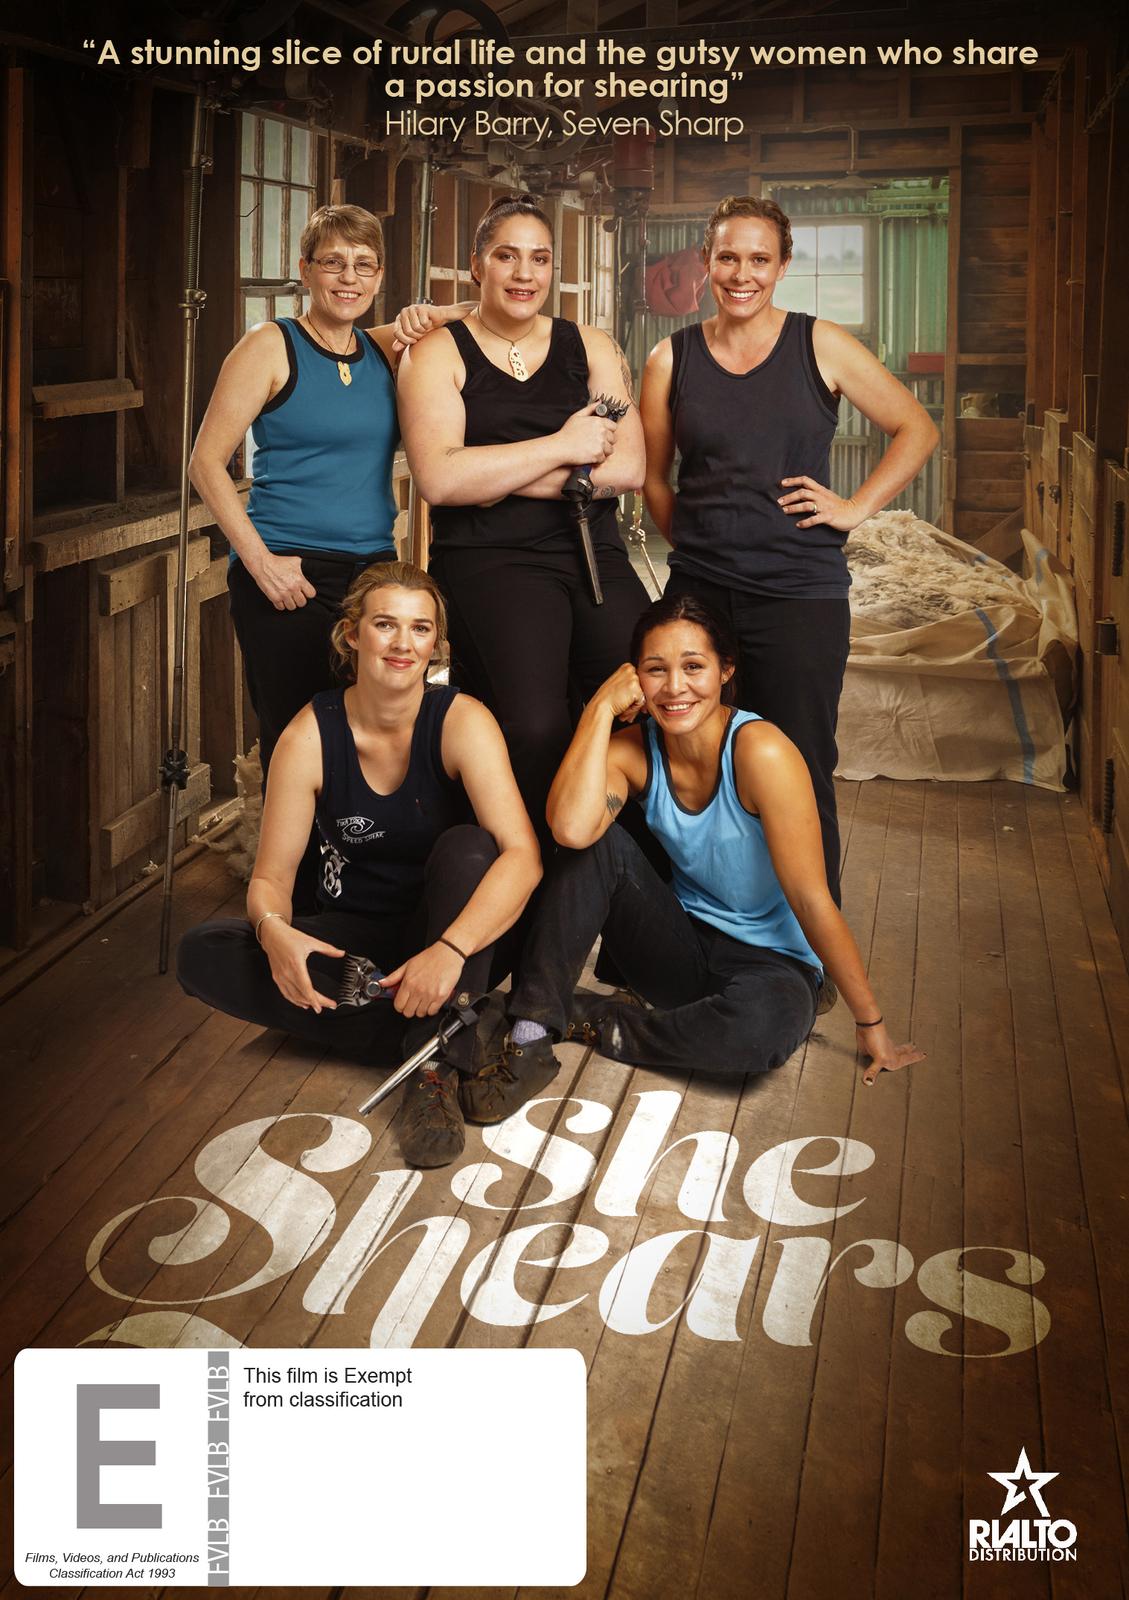 She Shears on DVD image